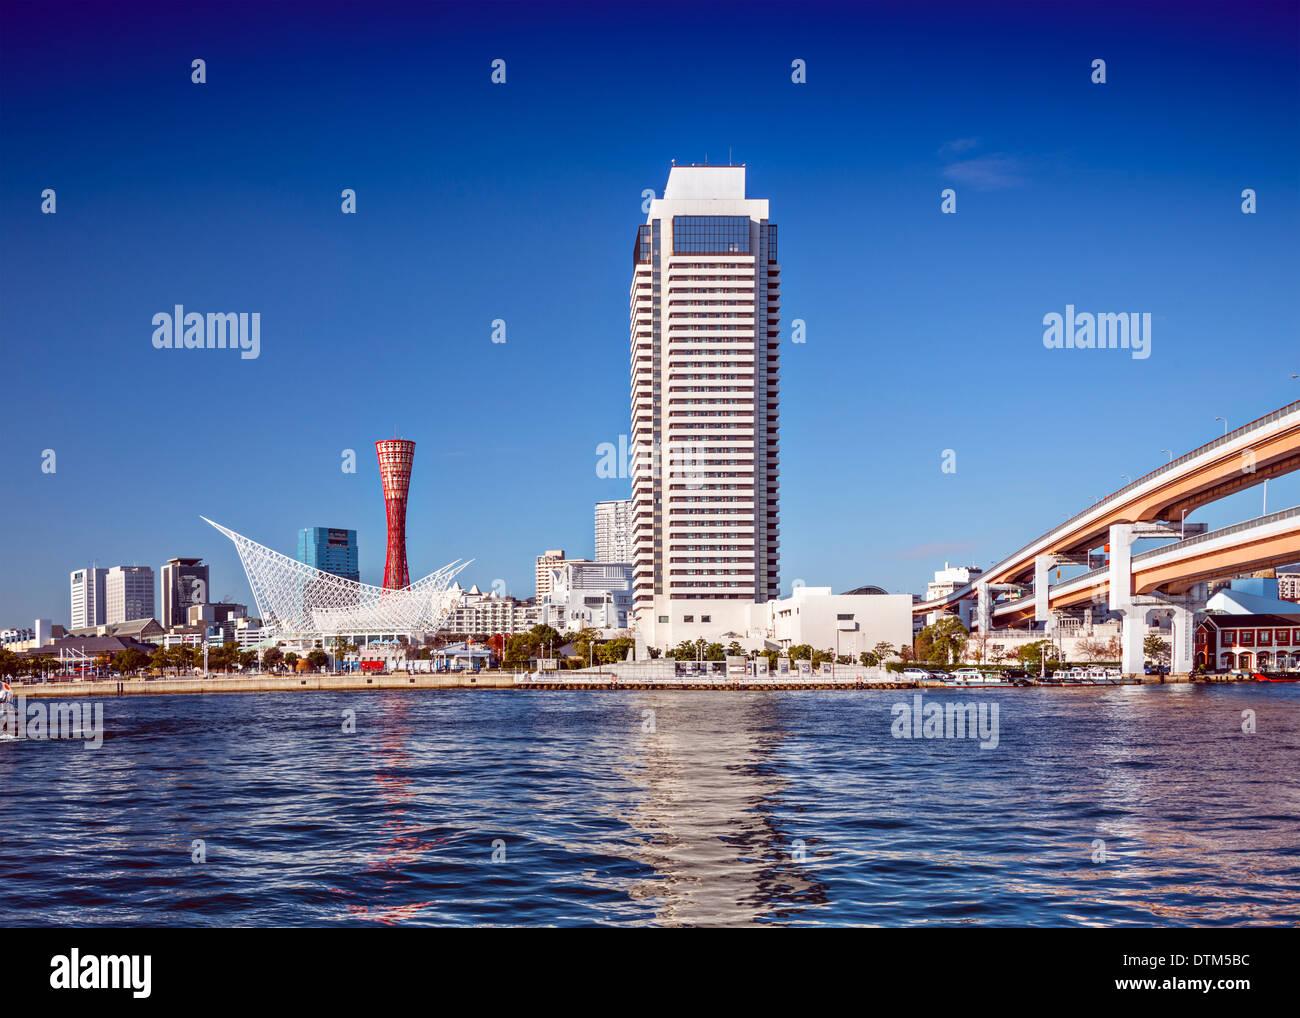 Kobe, Japan skyline at Harborland and Meriken Park. - Stock Image